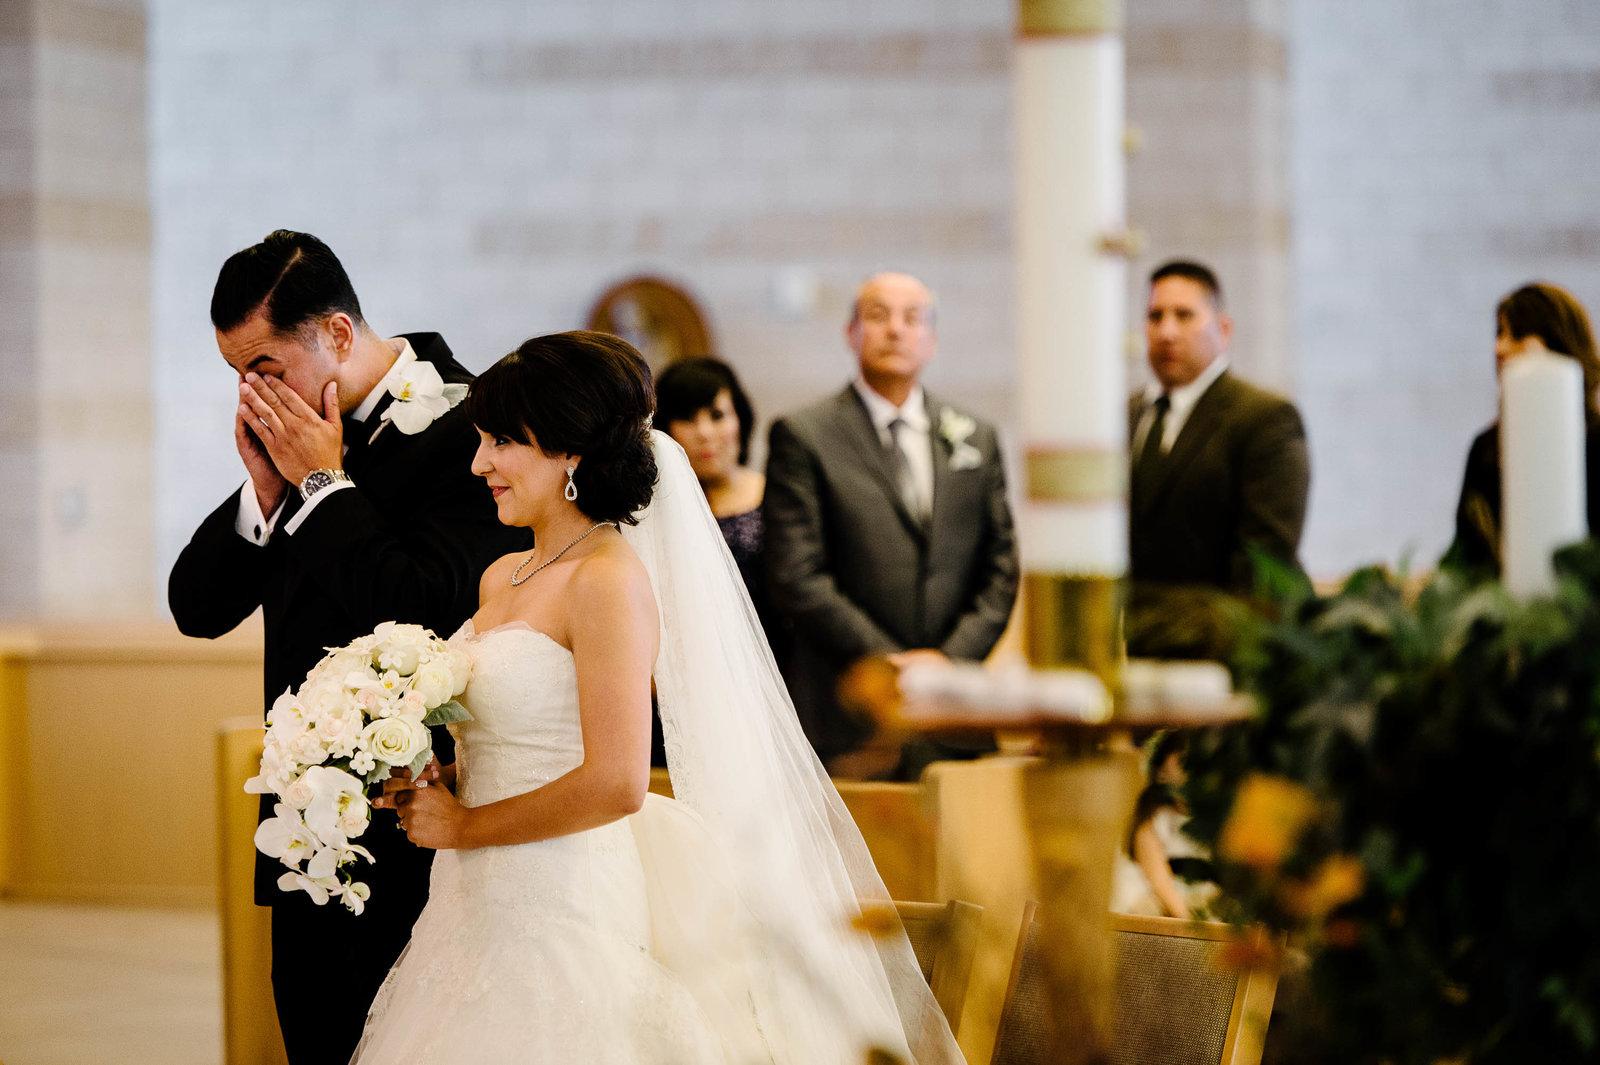 196-El-paso-wedding-photographer-MiJa_0385